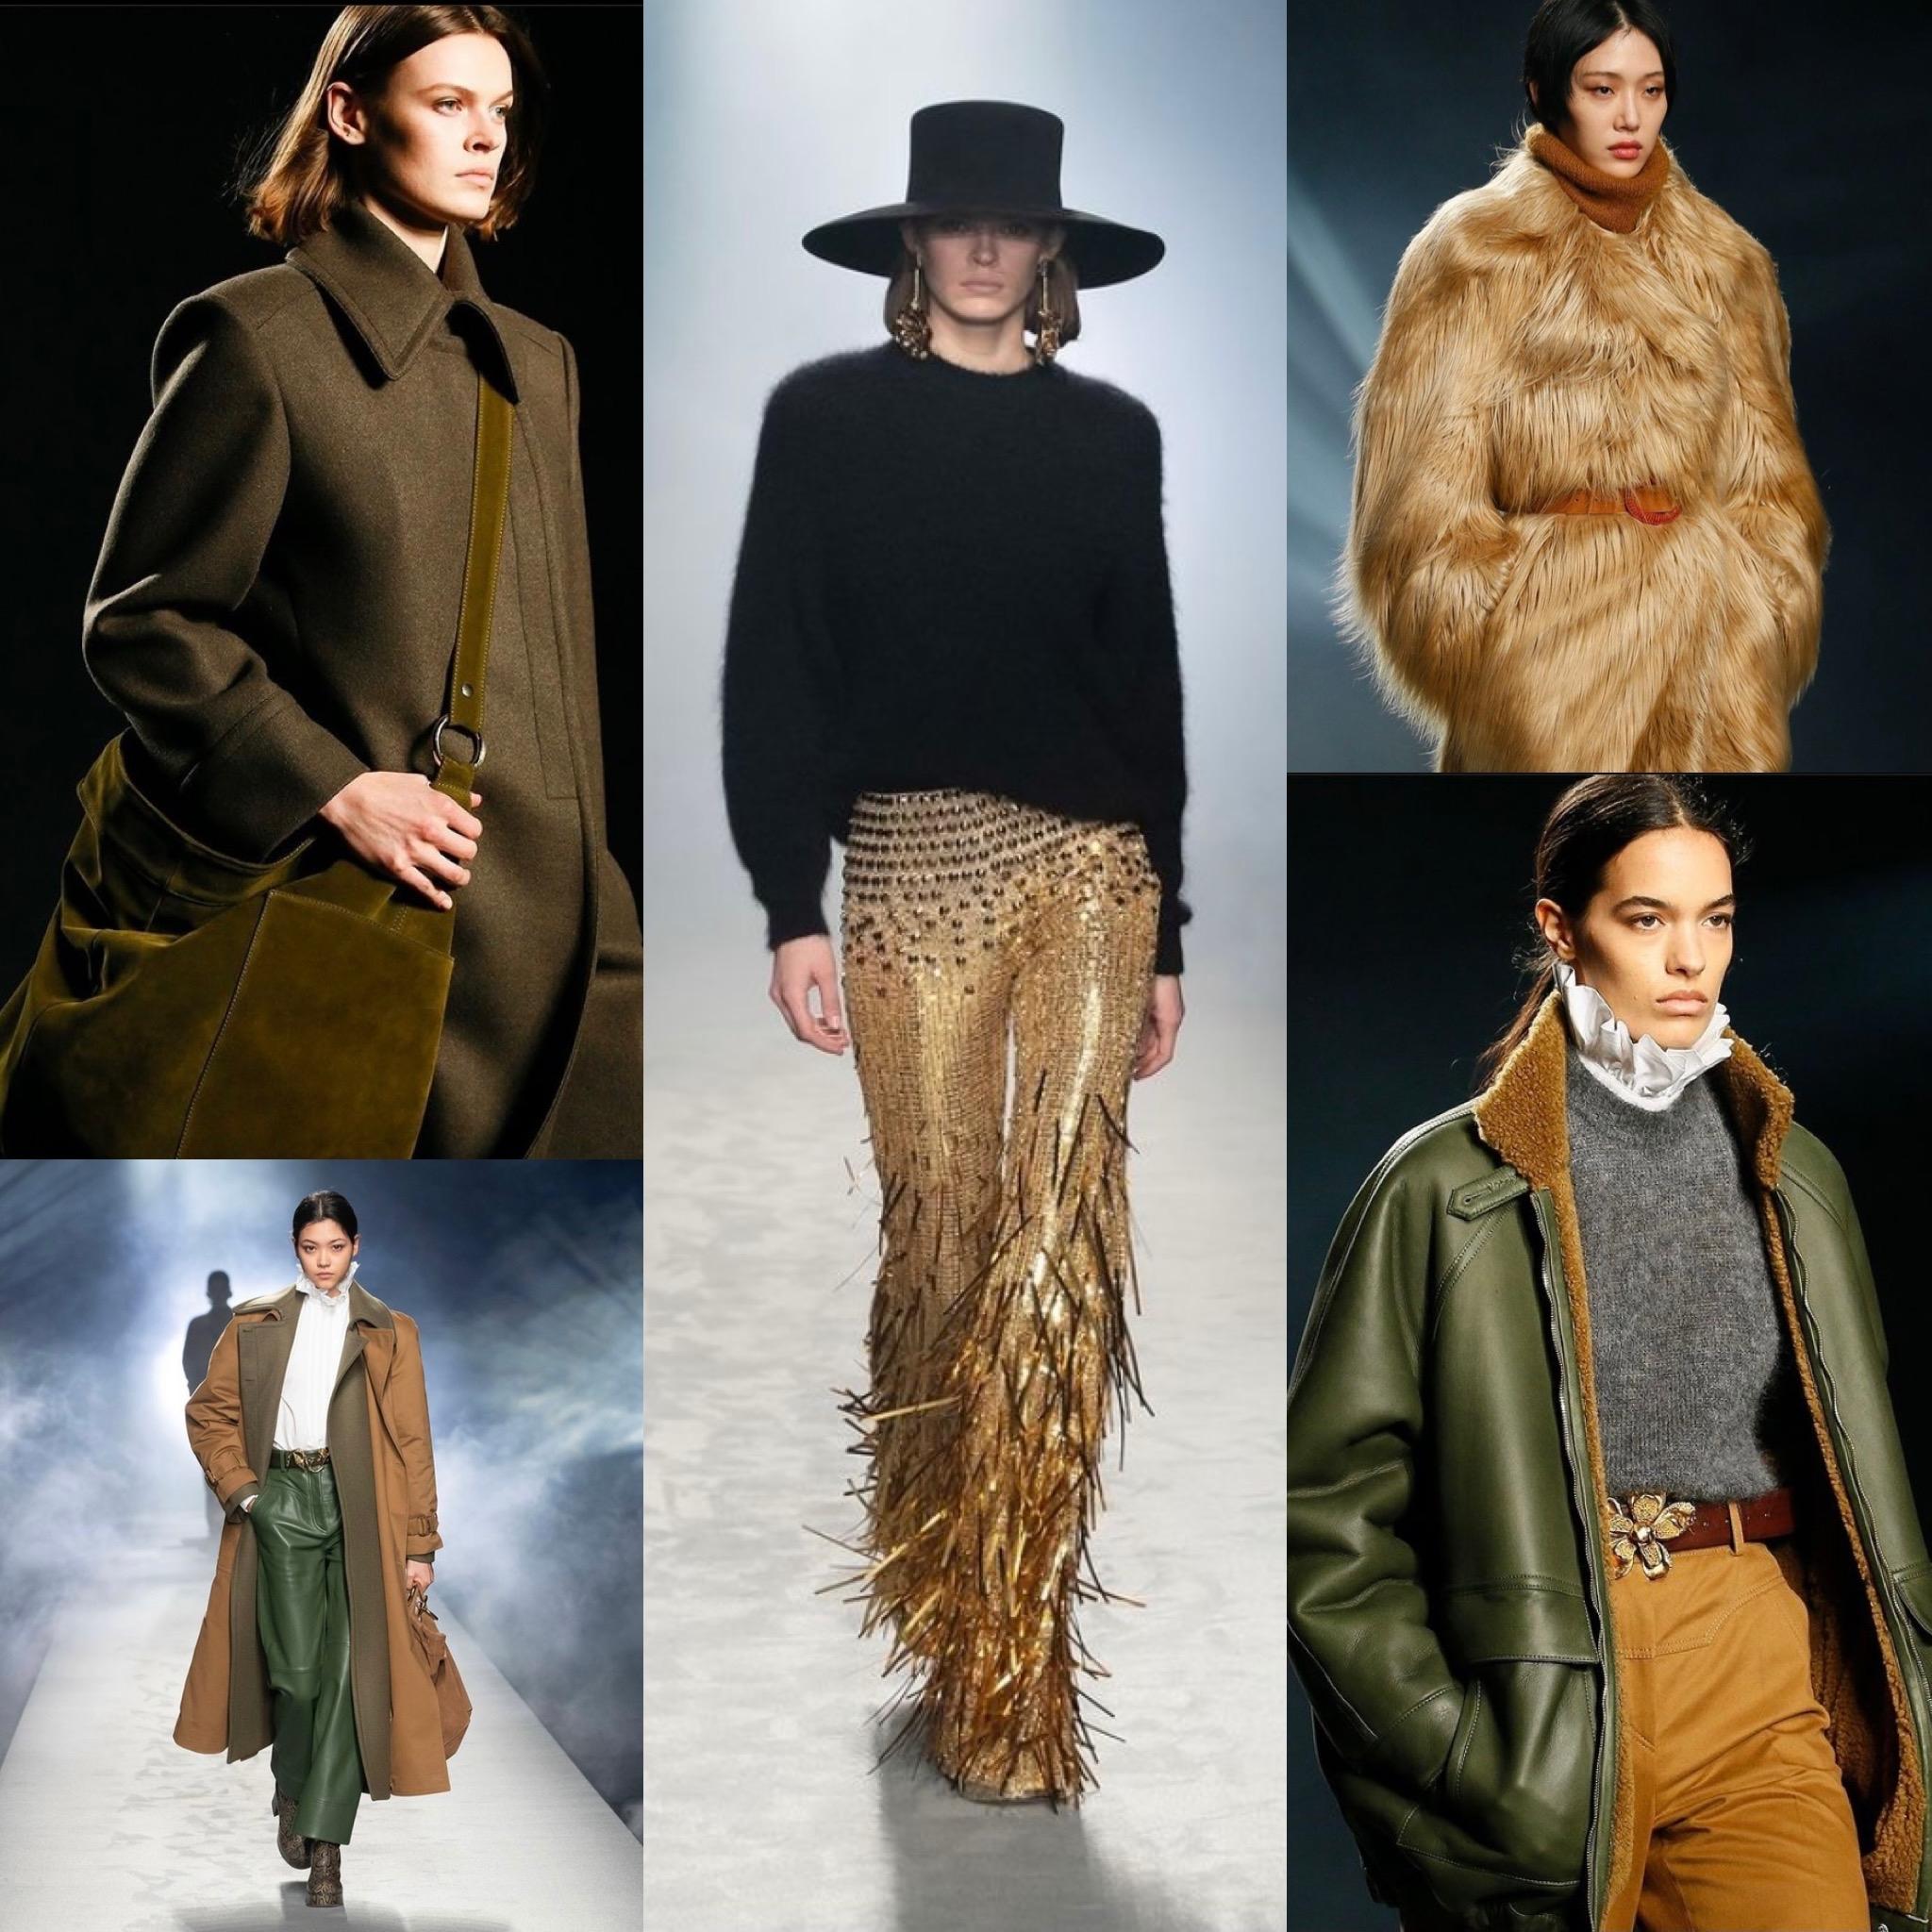 Alberta Ferretti, a new idea of woman in Milan fashion week